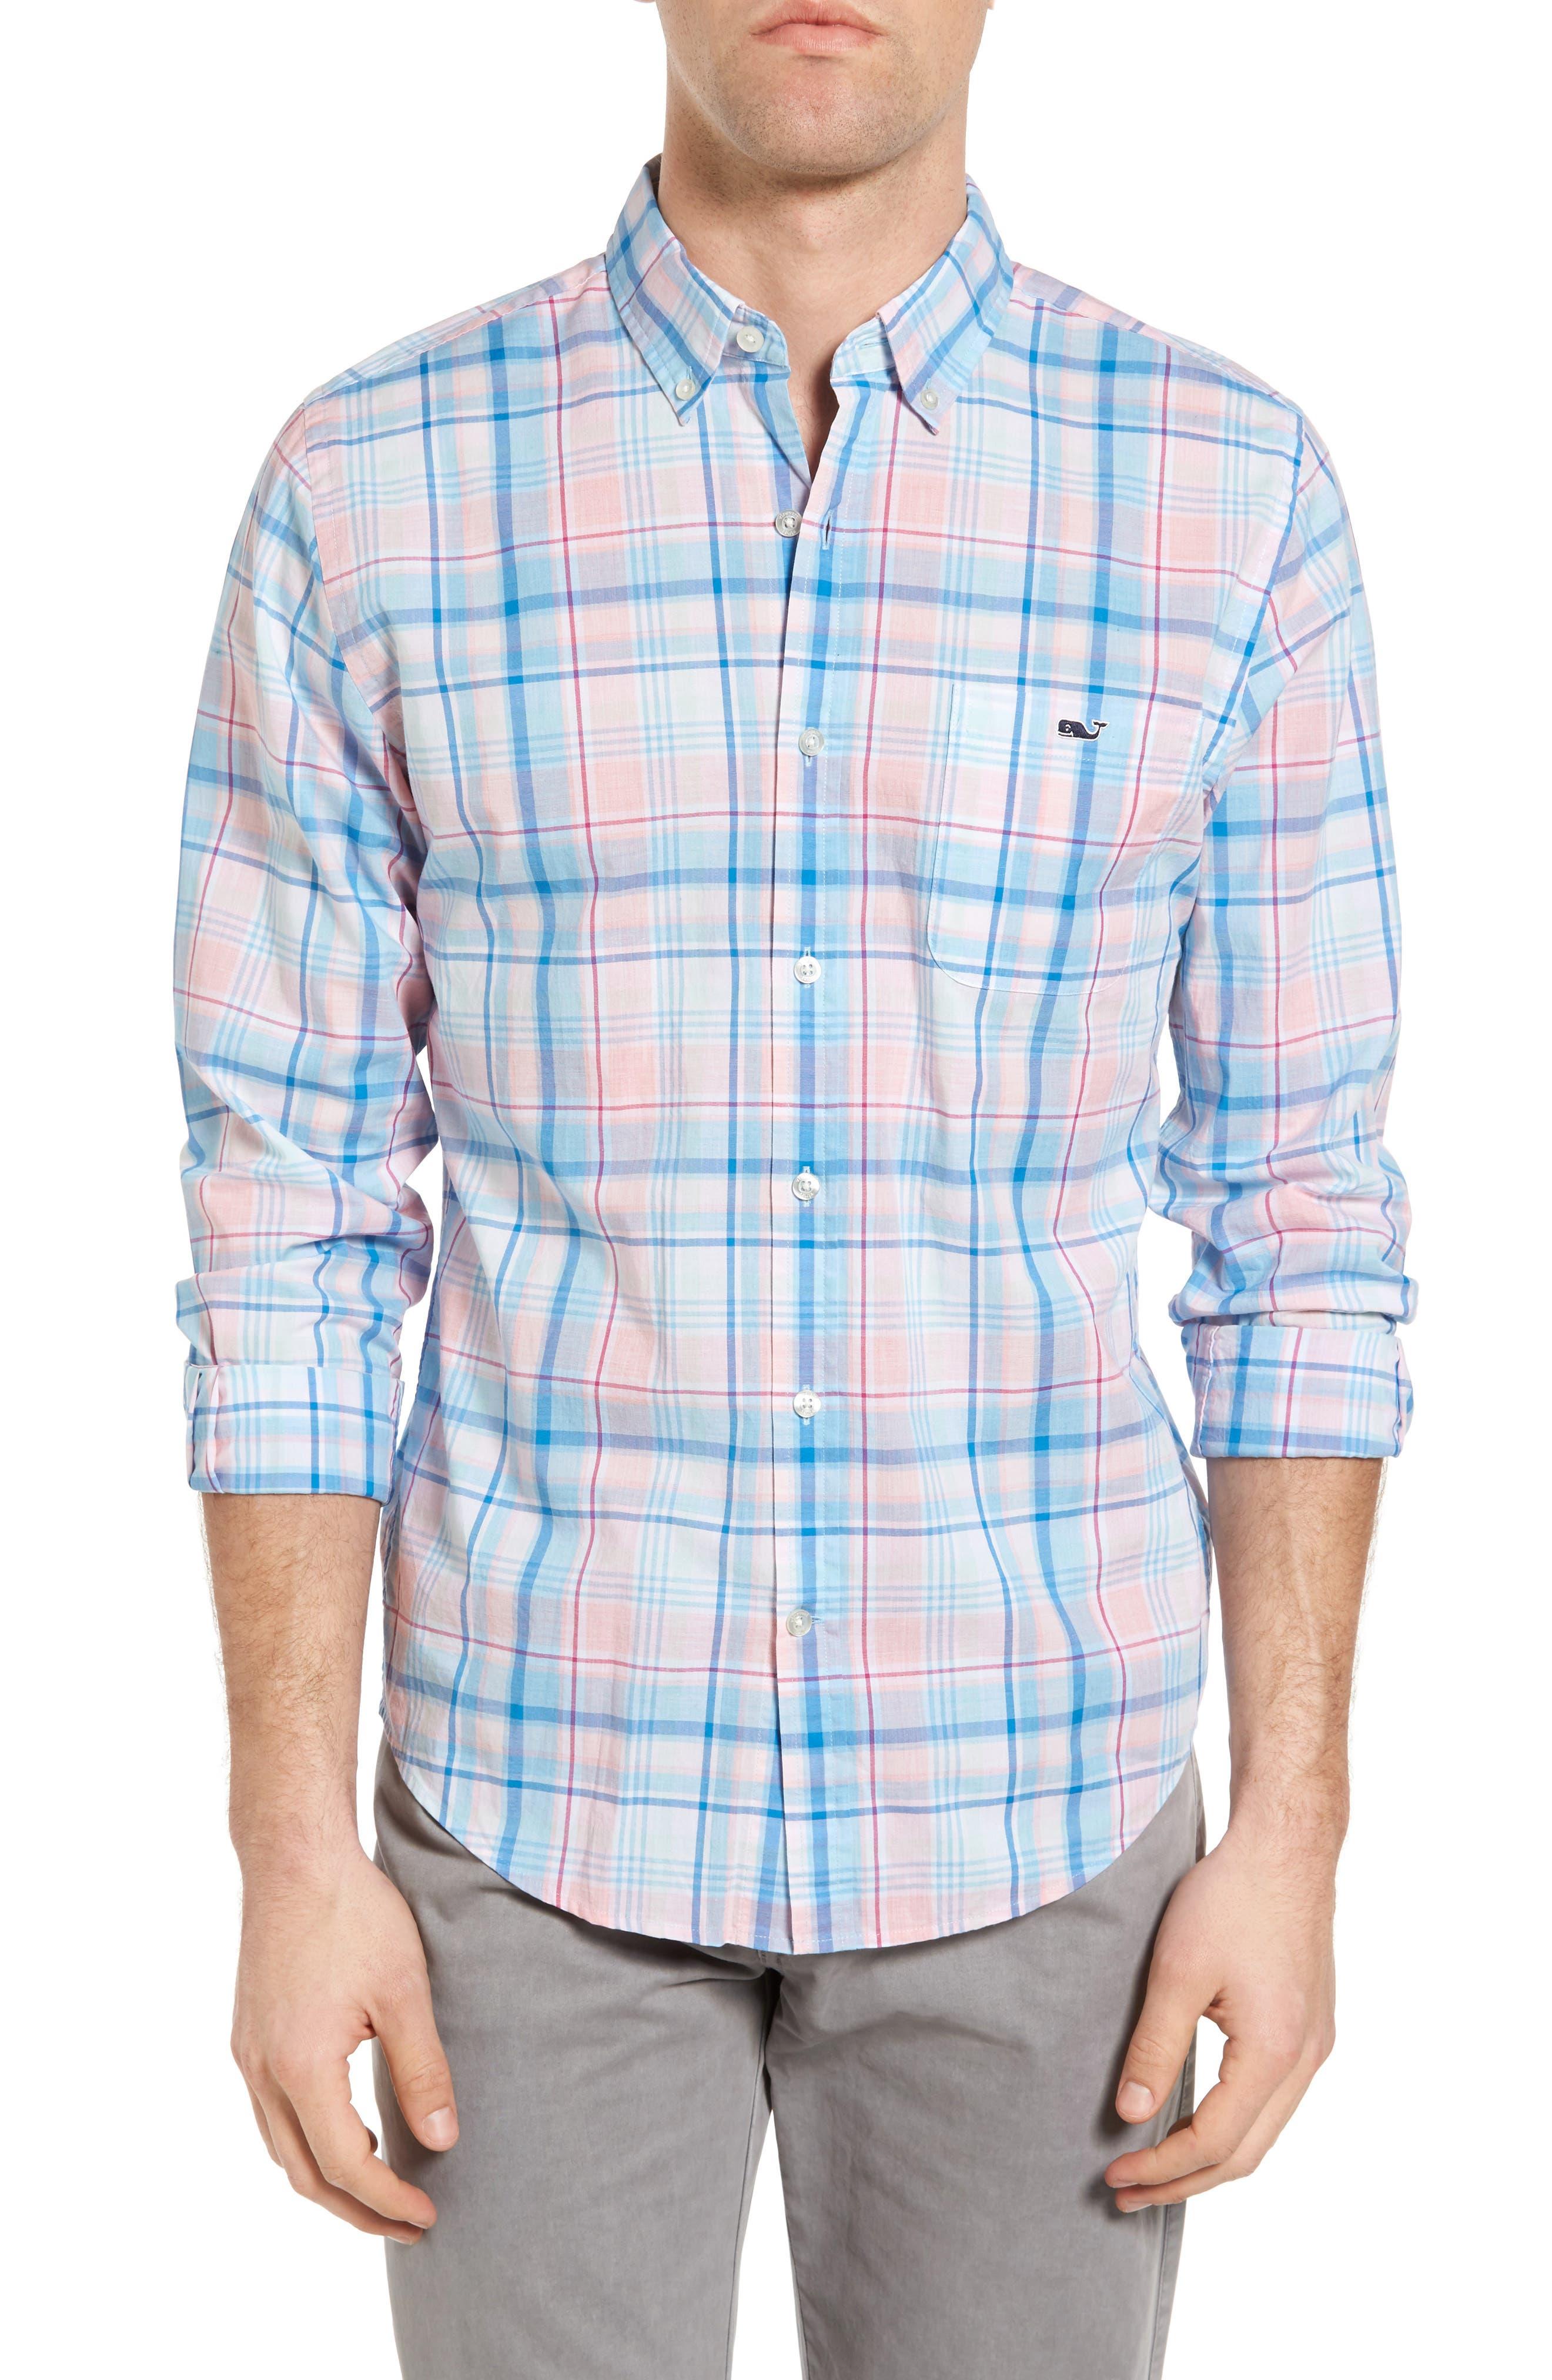 Main Image - Vineyard Vines Sabab Rock Tucker Slim Fit Plaid Sport Shirt